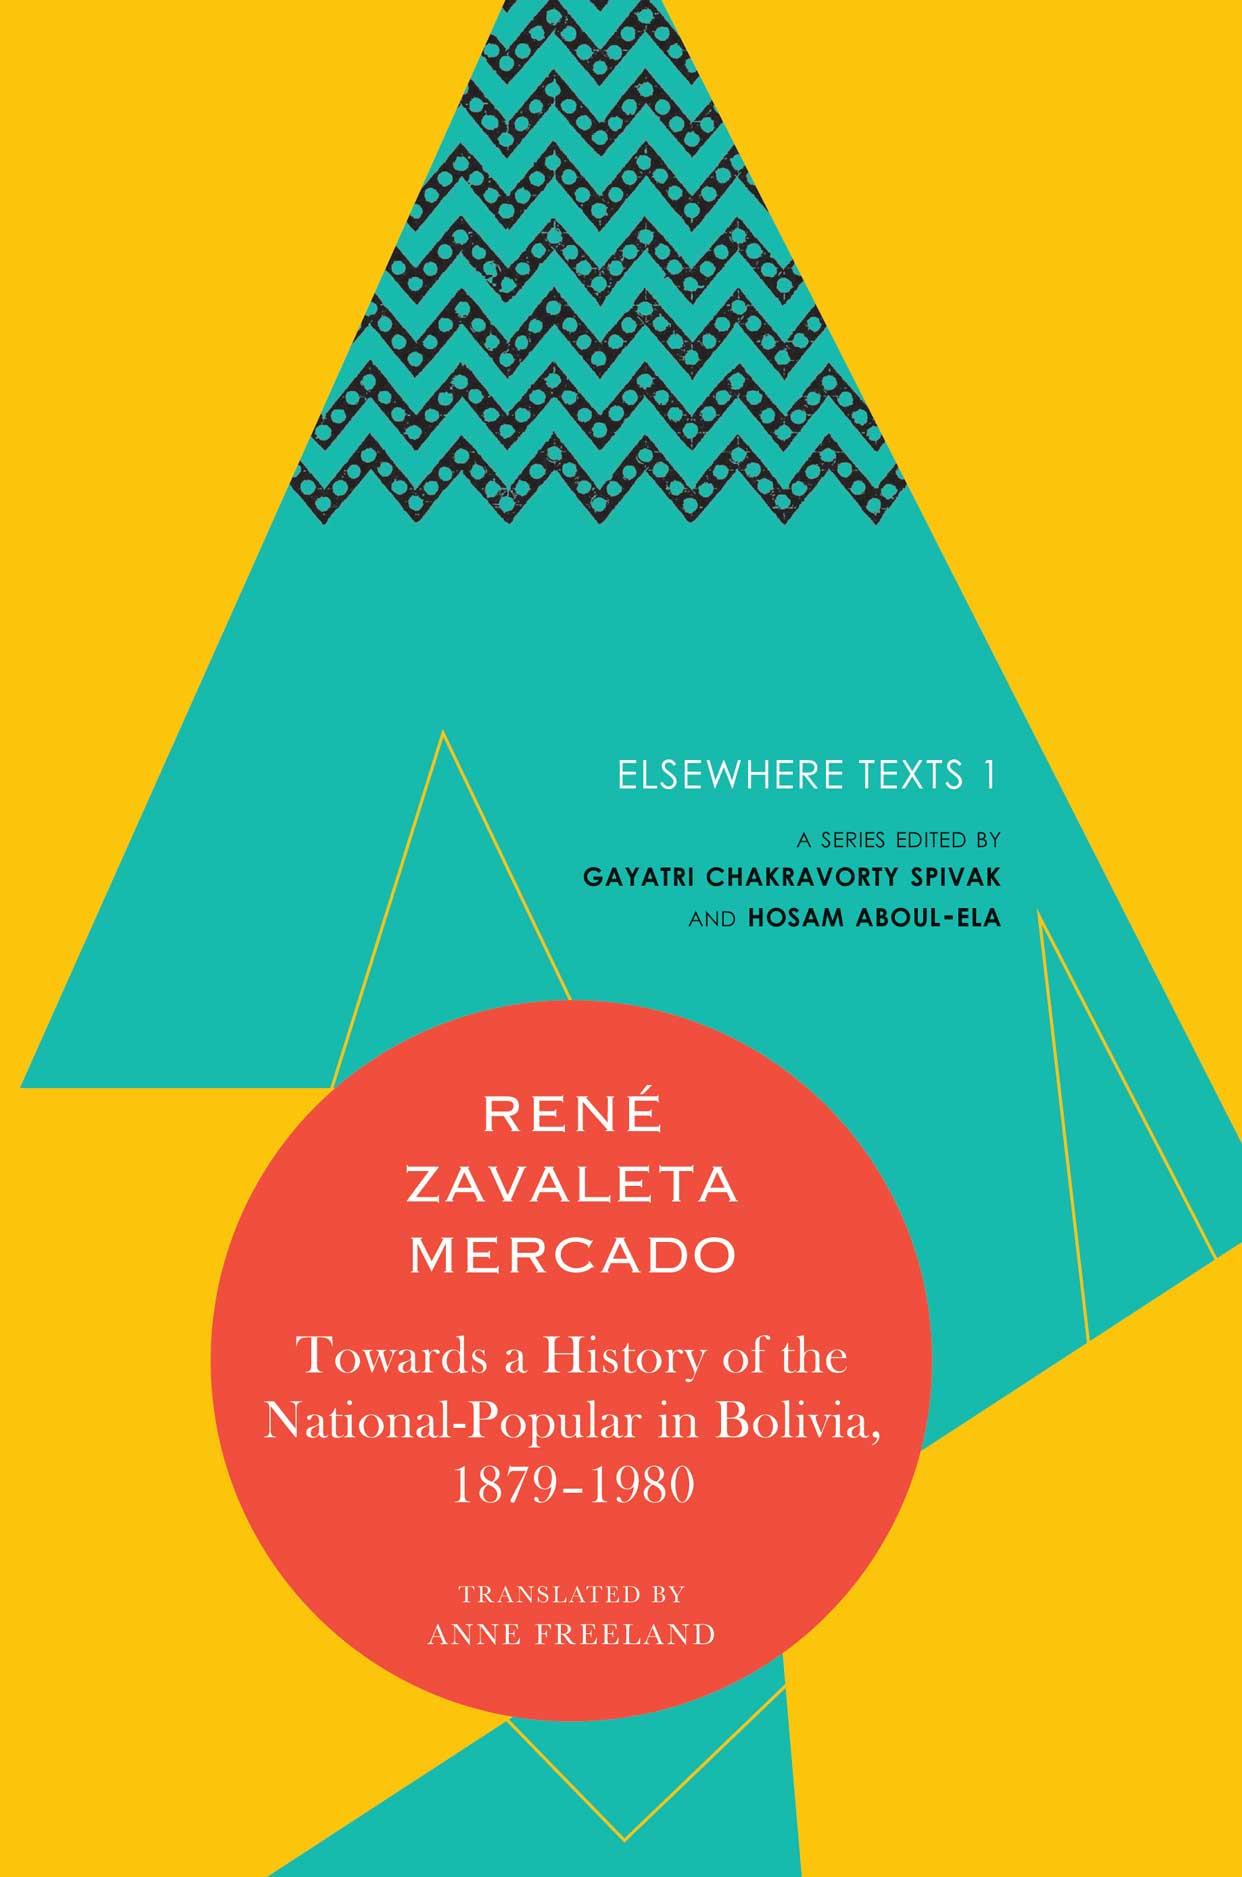 Towards a History of the National-Popular in Bolivia, 1879–1980 by René Zavaleta Mercado |  Seagull Books